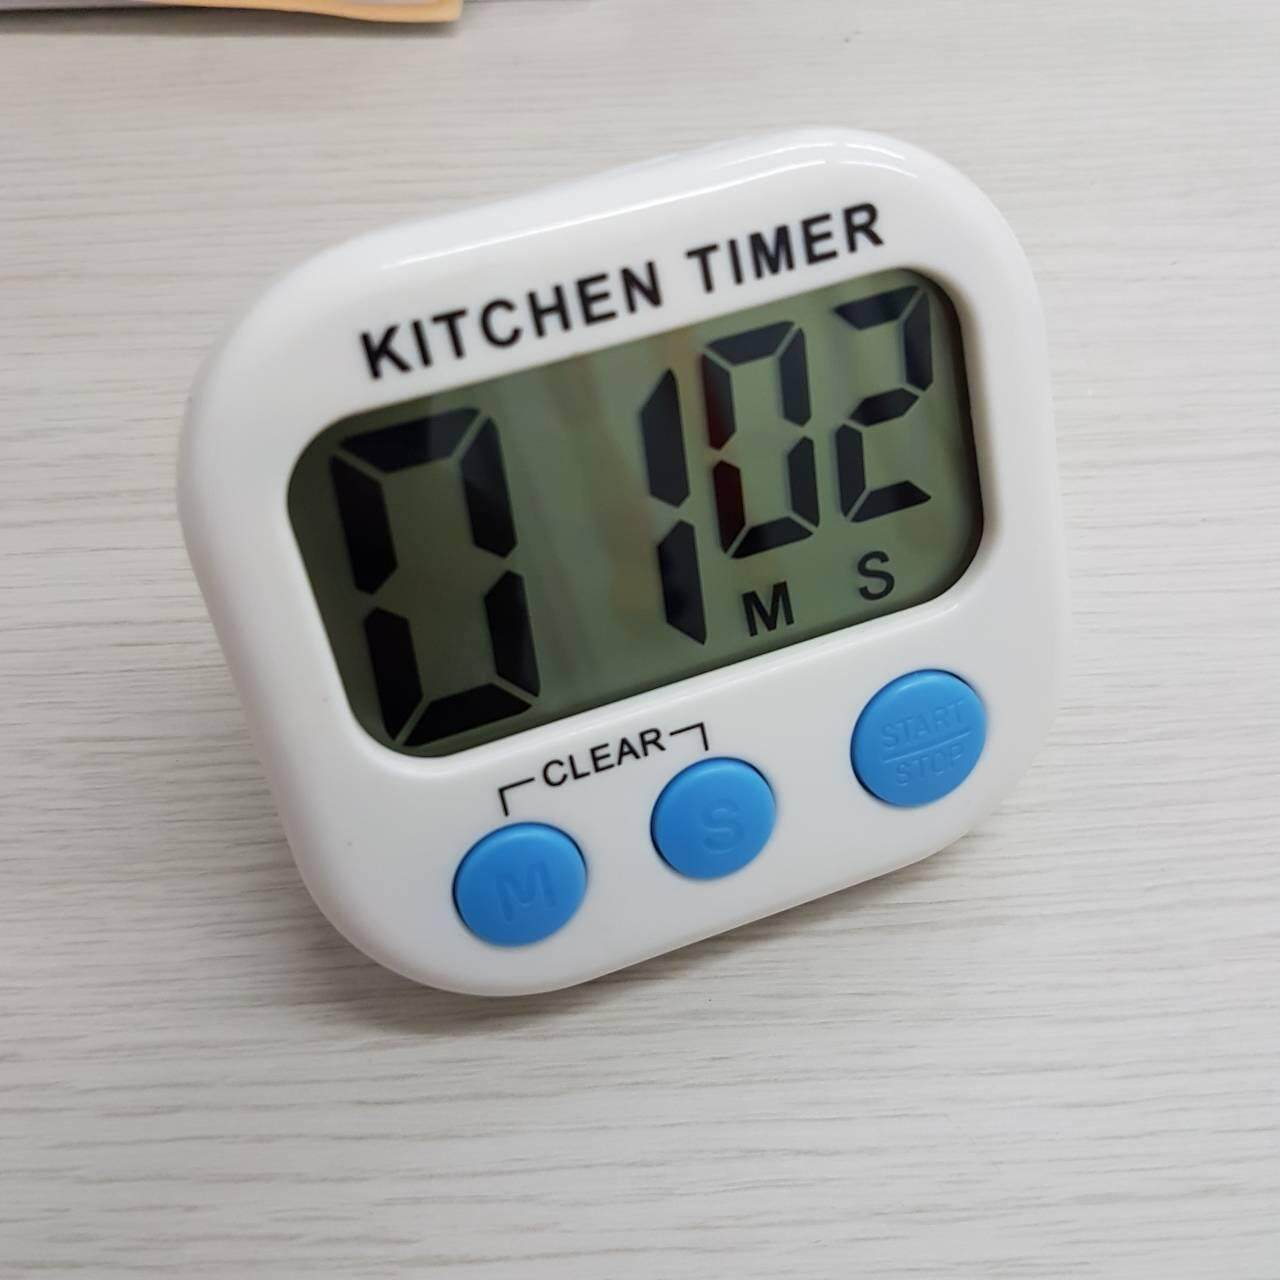 KITCHEN TIMER XL103 นาฬิกาจับเวลา Digital kitchen timer